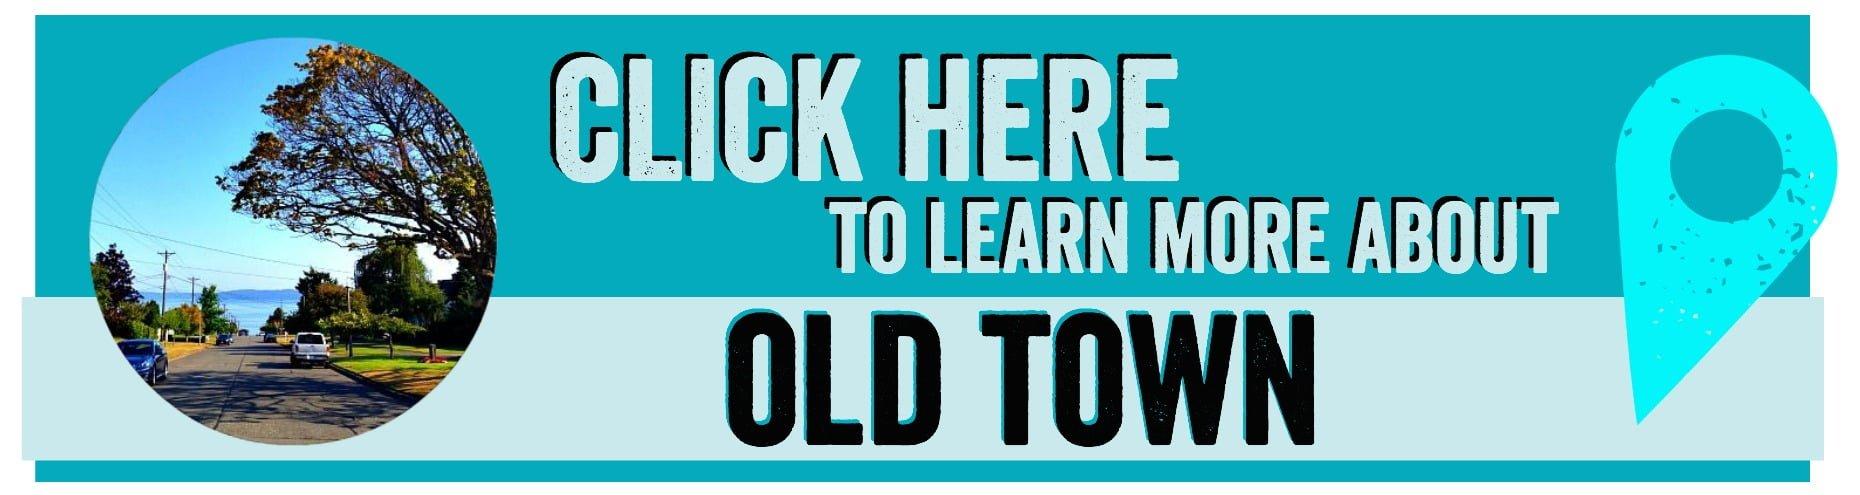 MoveToTacoma_OldTown